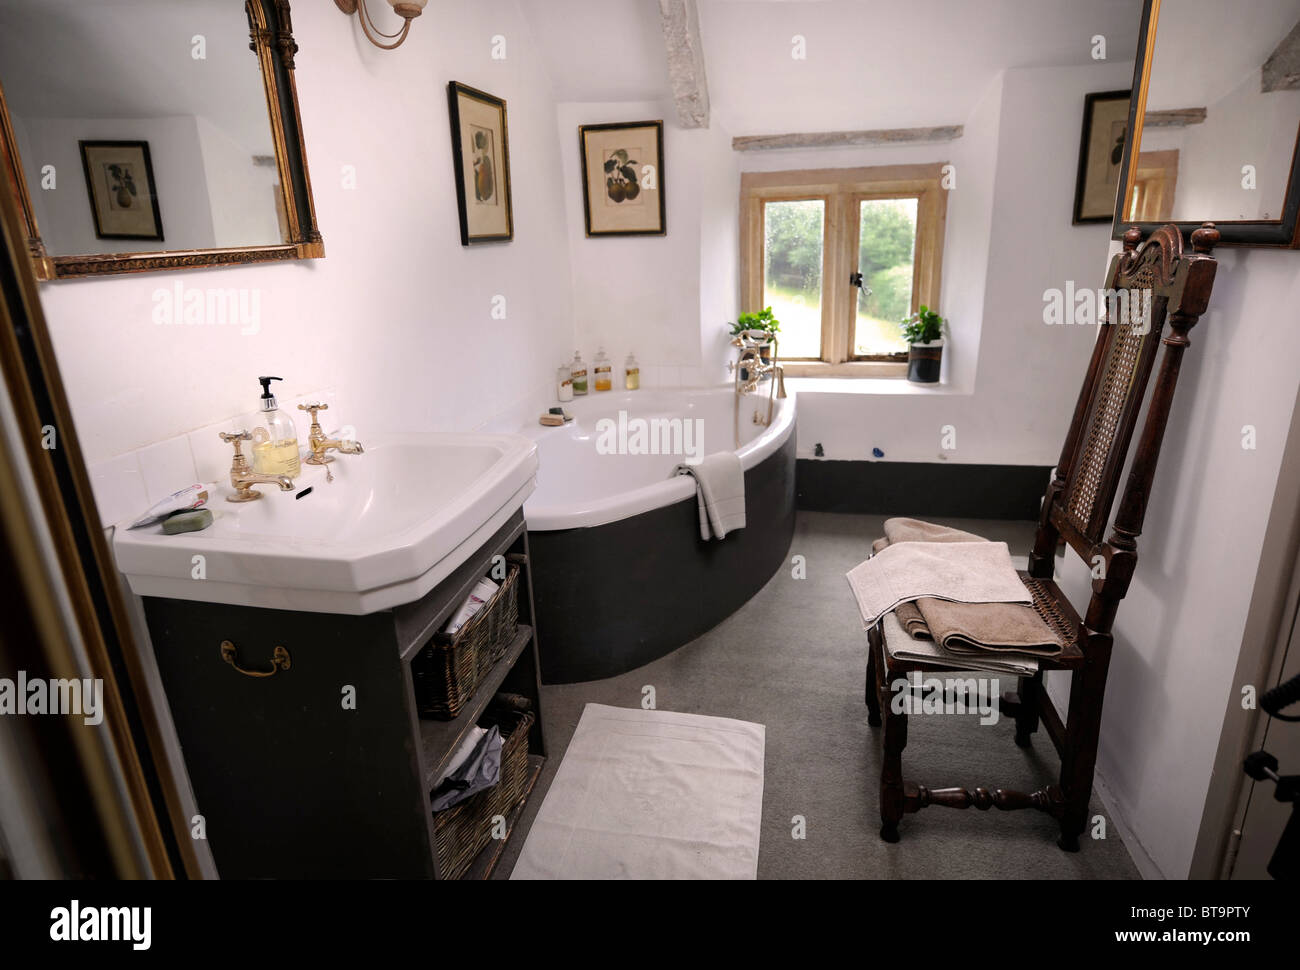 Sala Da Bagno Stile Contemporaneo : Bagno somerset immagini & bagno somerset fotos stock alamy